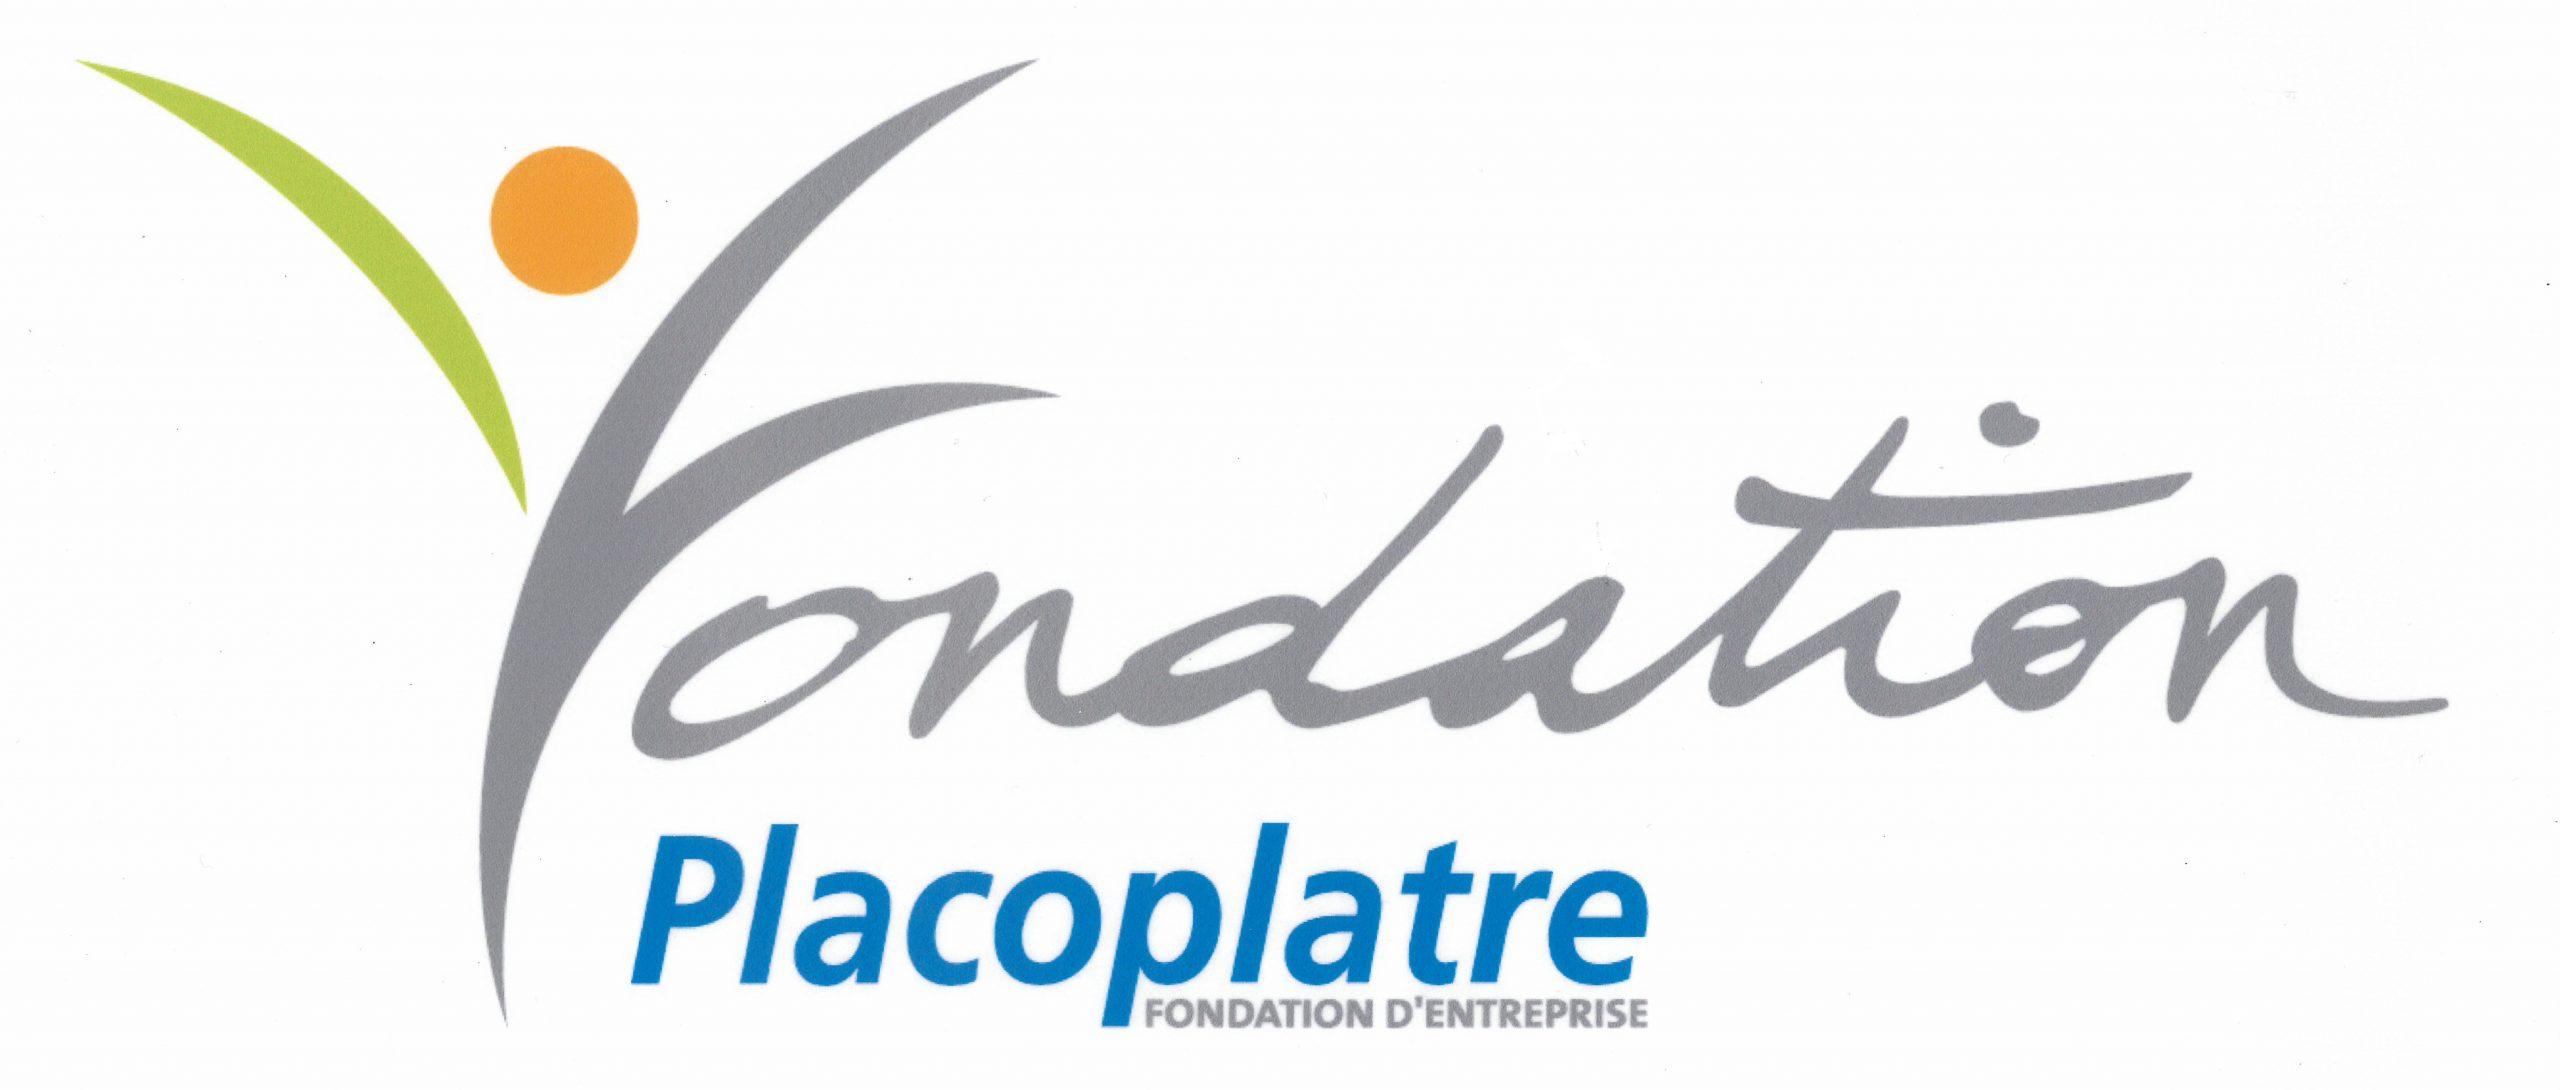 Fondation placoplatre